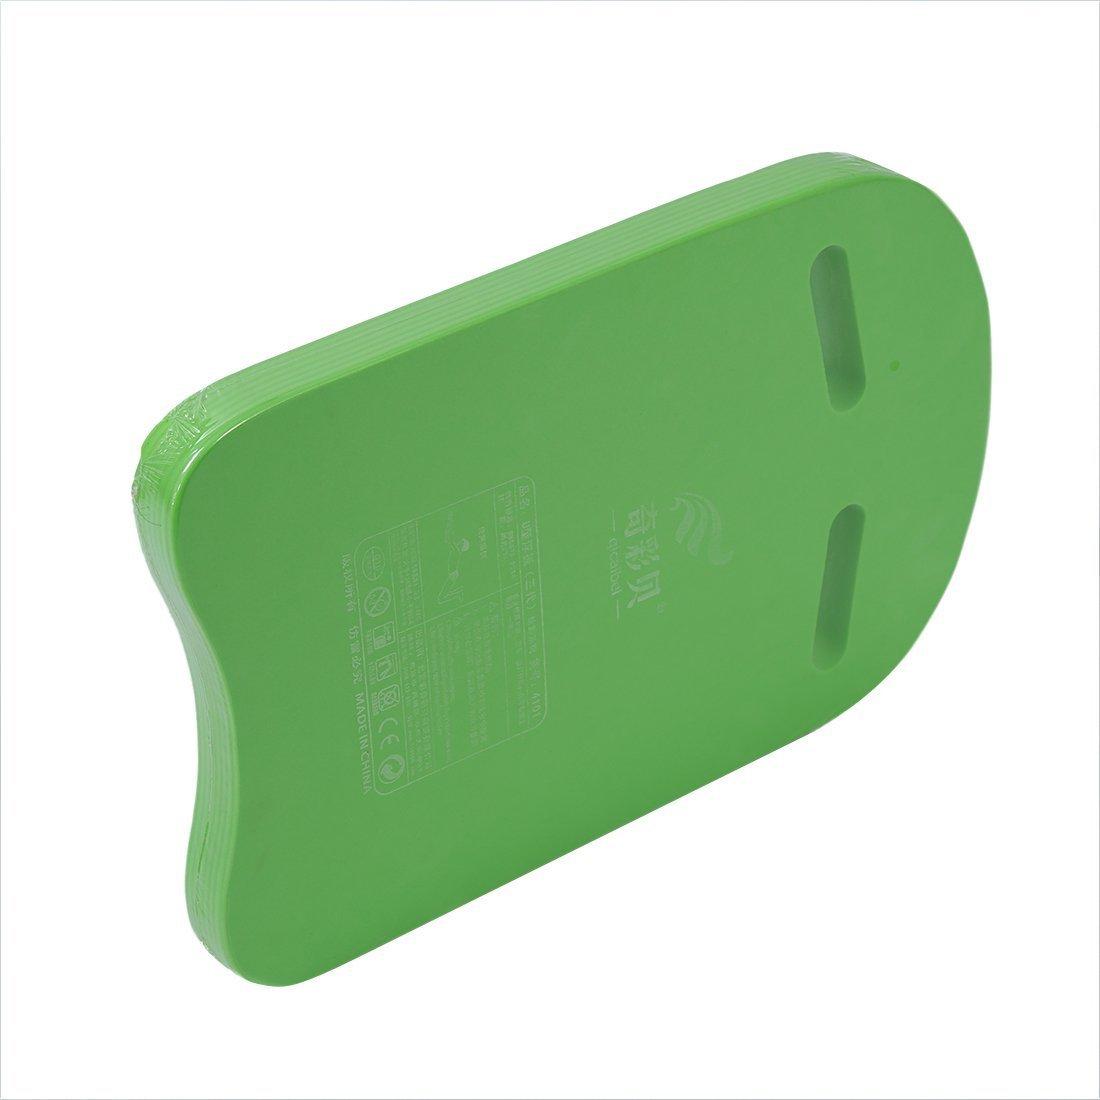 Katomi Swimming Swim Safty Pool Training Aid Kickboard Float Board Tool For Kids Adults Green